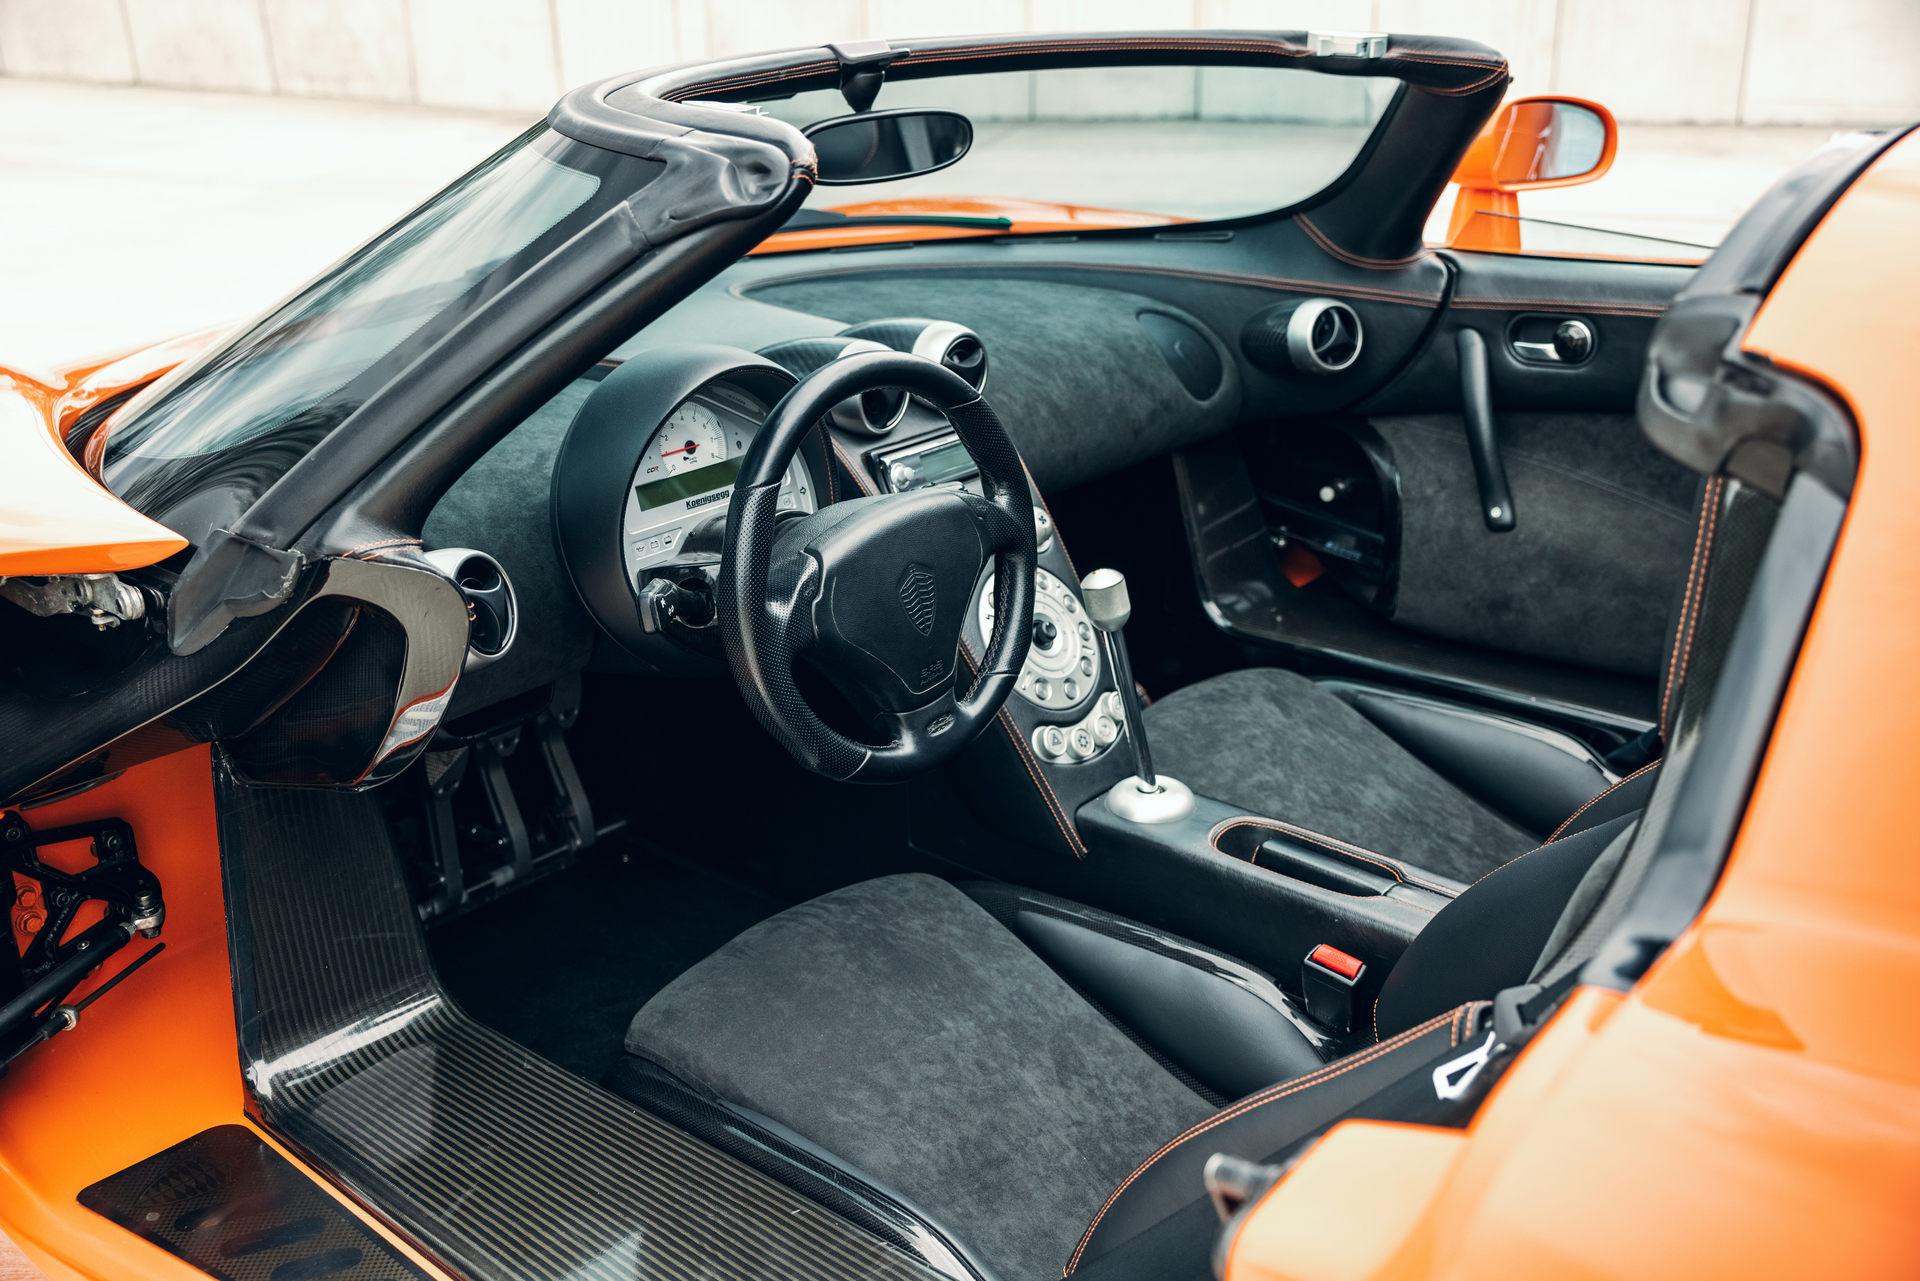 Салон первогоэкземпляра Koenigsegg CCR